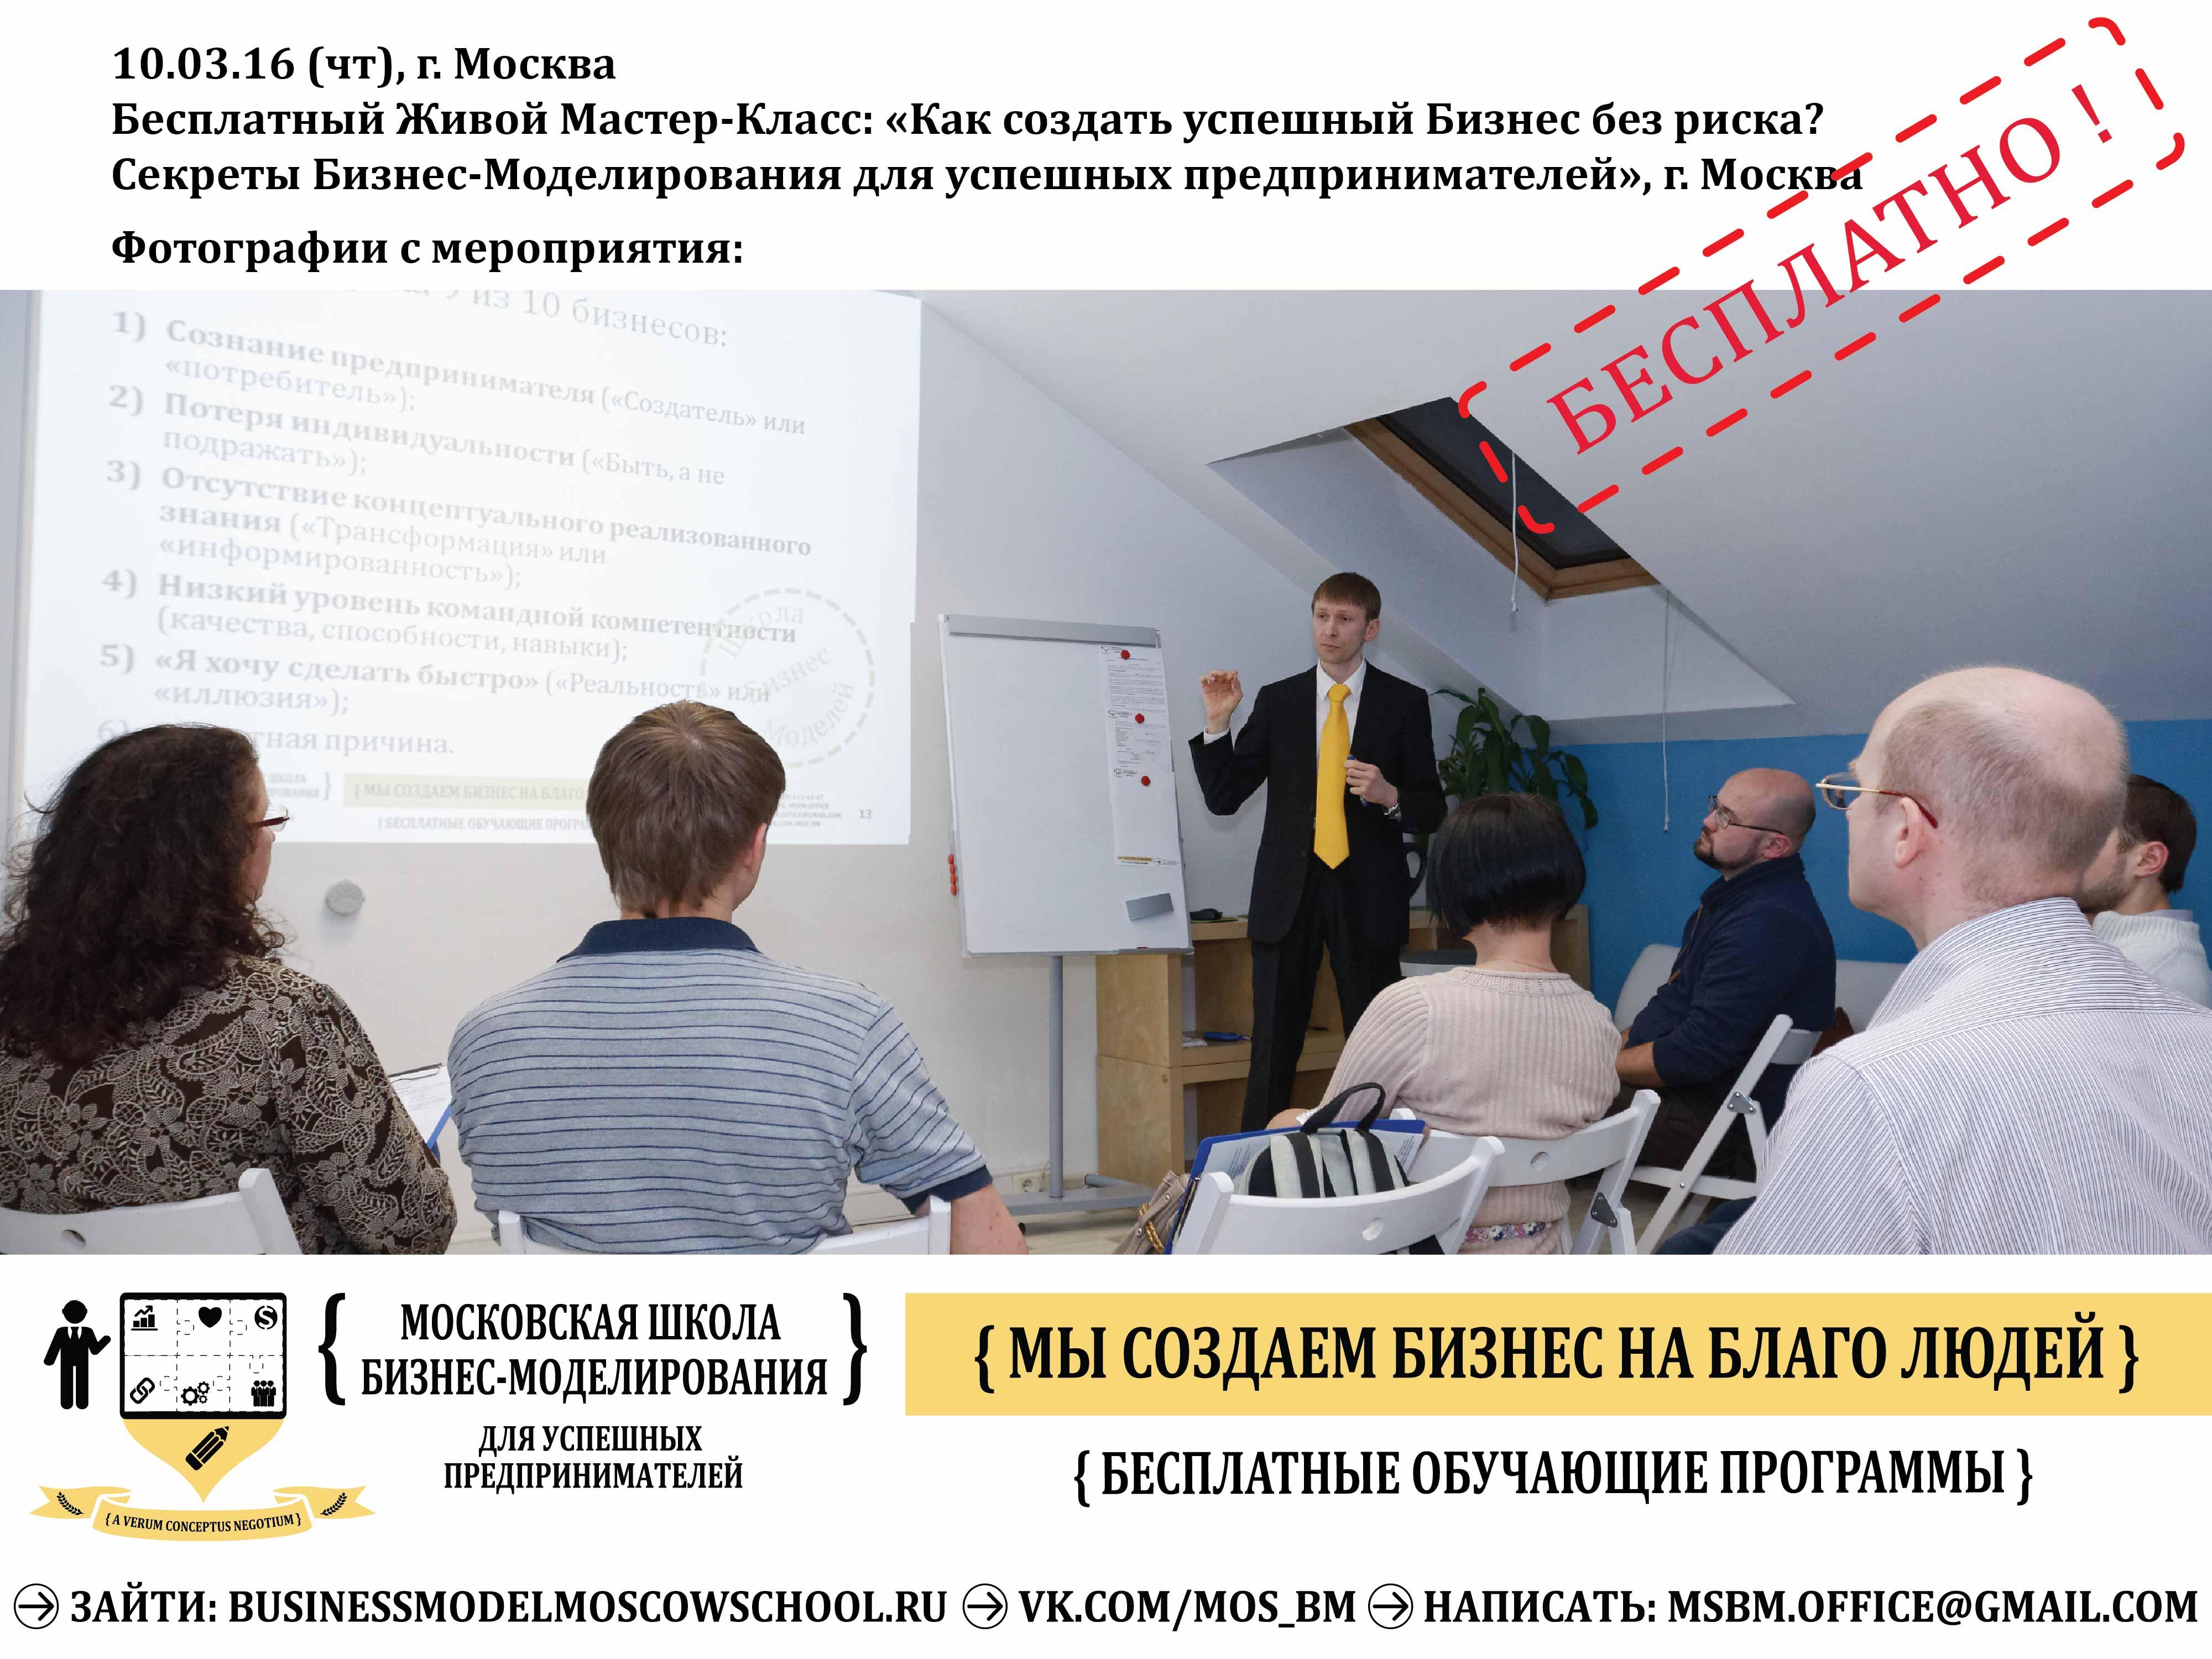 business_model_moscow_school_mclass_photo_10.03.16